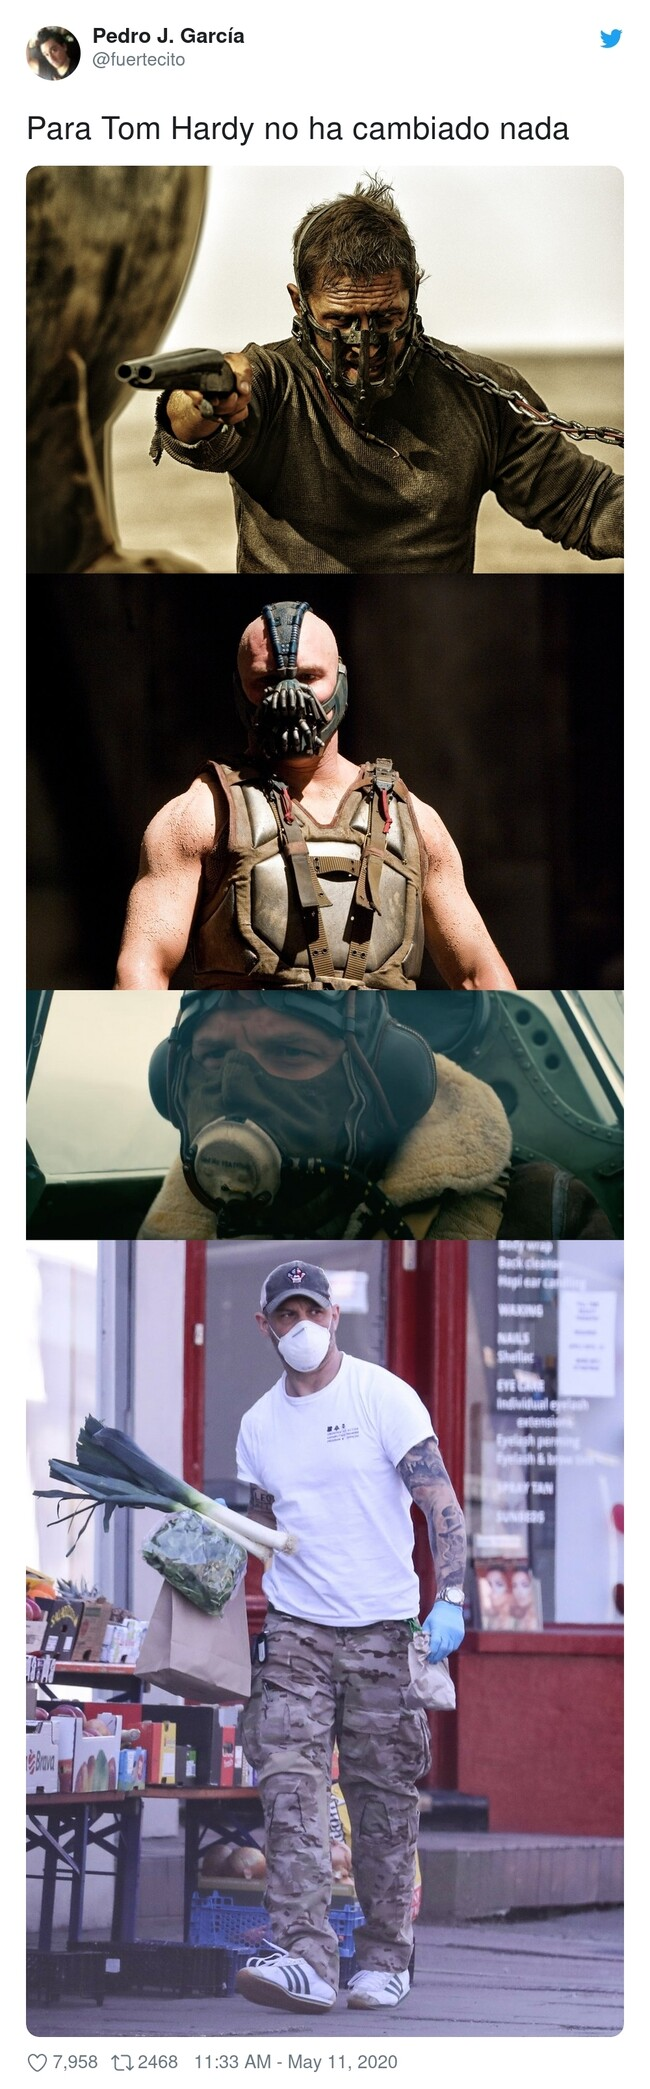 15758 - Primer famoso que usa máscara para que le reconozcan por la calle, por @fuertecito